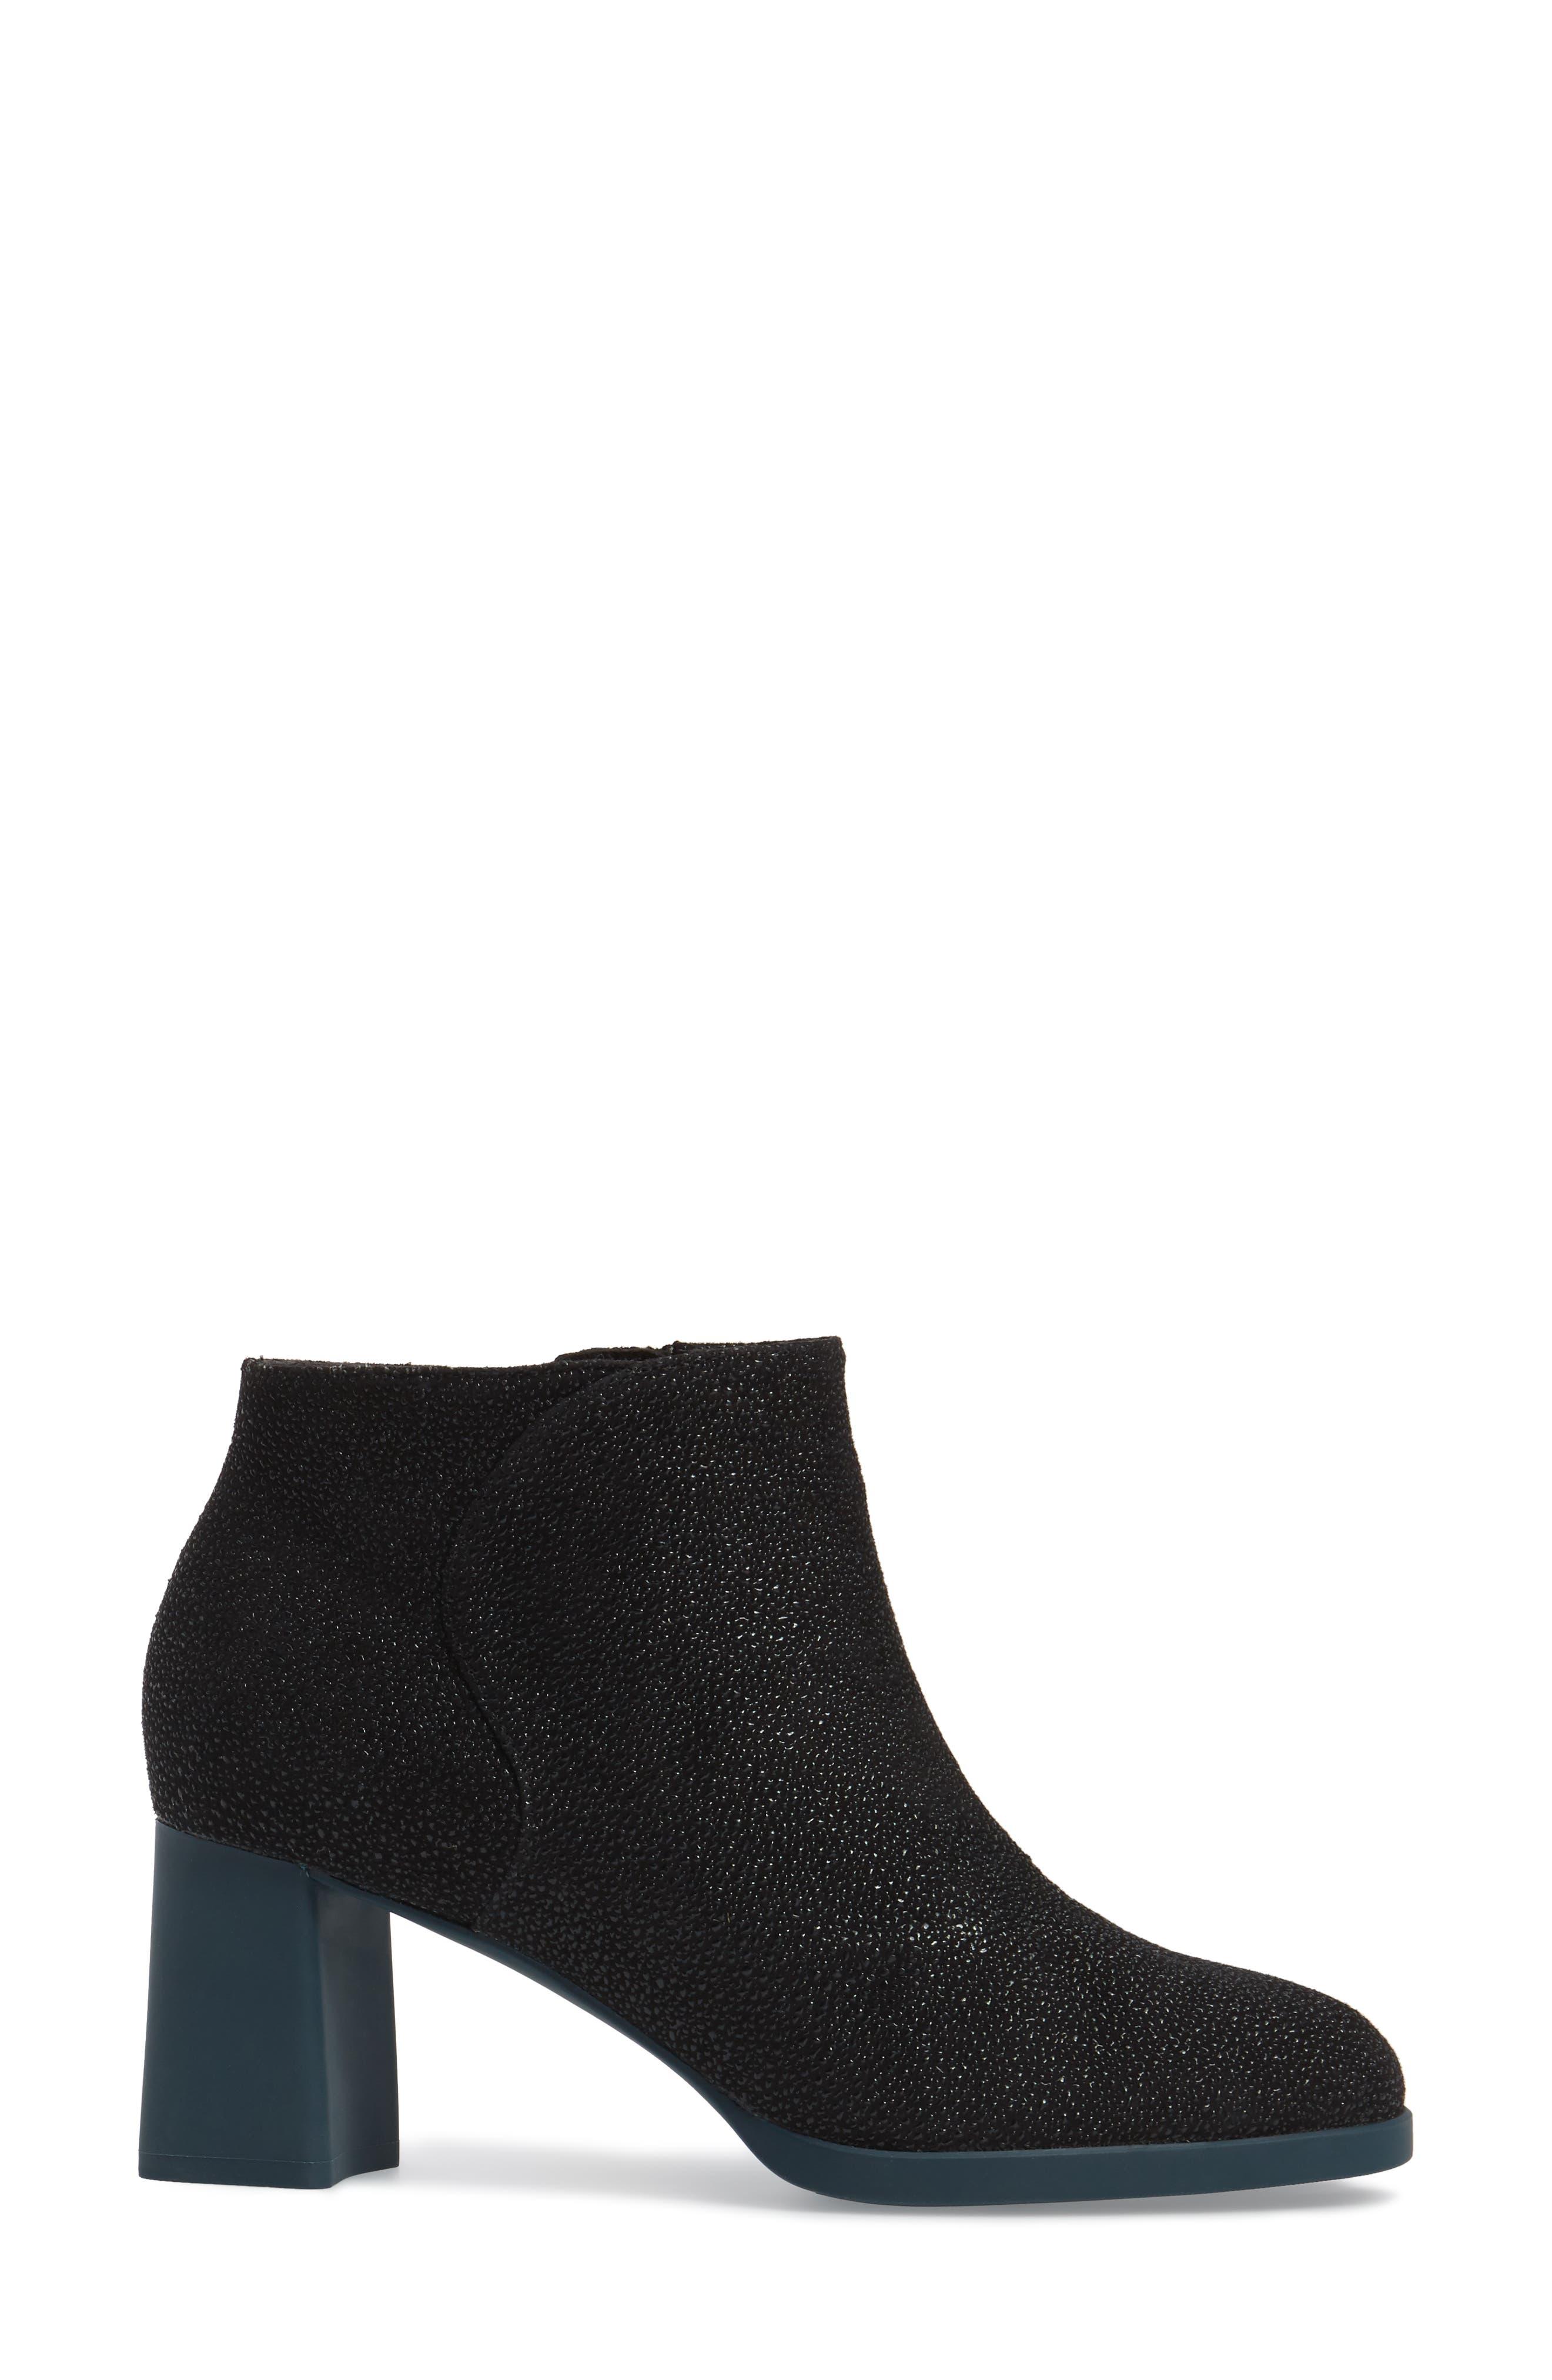 Kara Flared Heel Bootie,                             Alternate thumbnail 3, color,                             Black Sparkle Leather